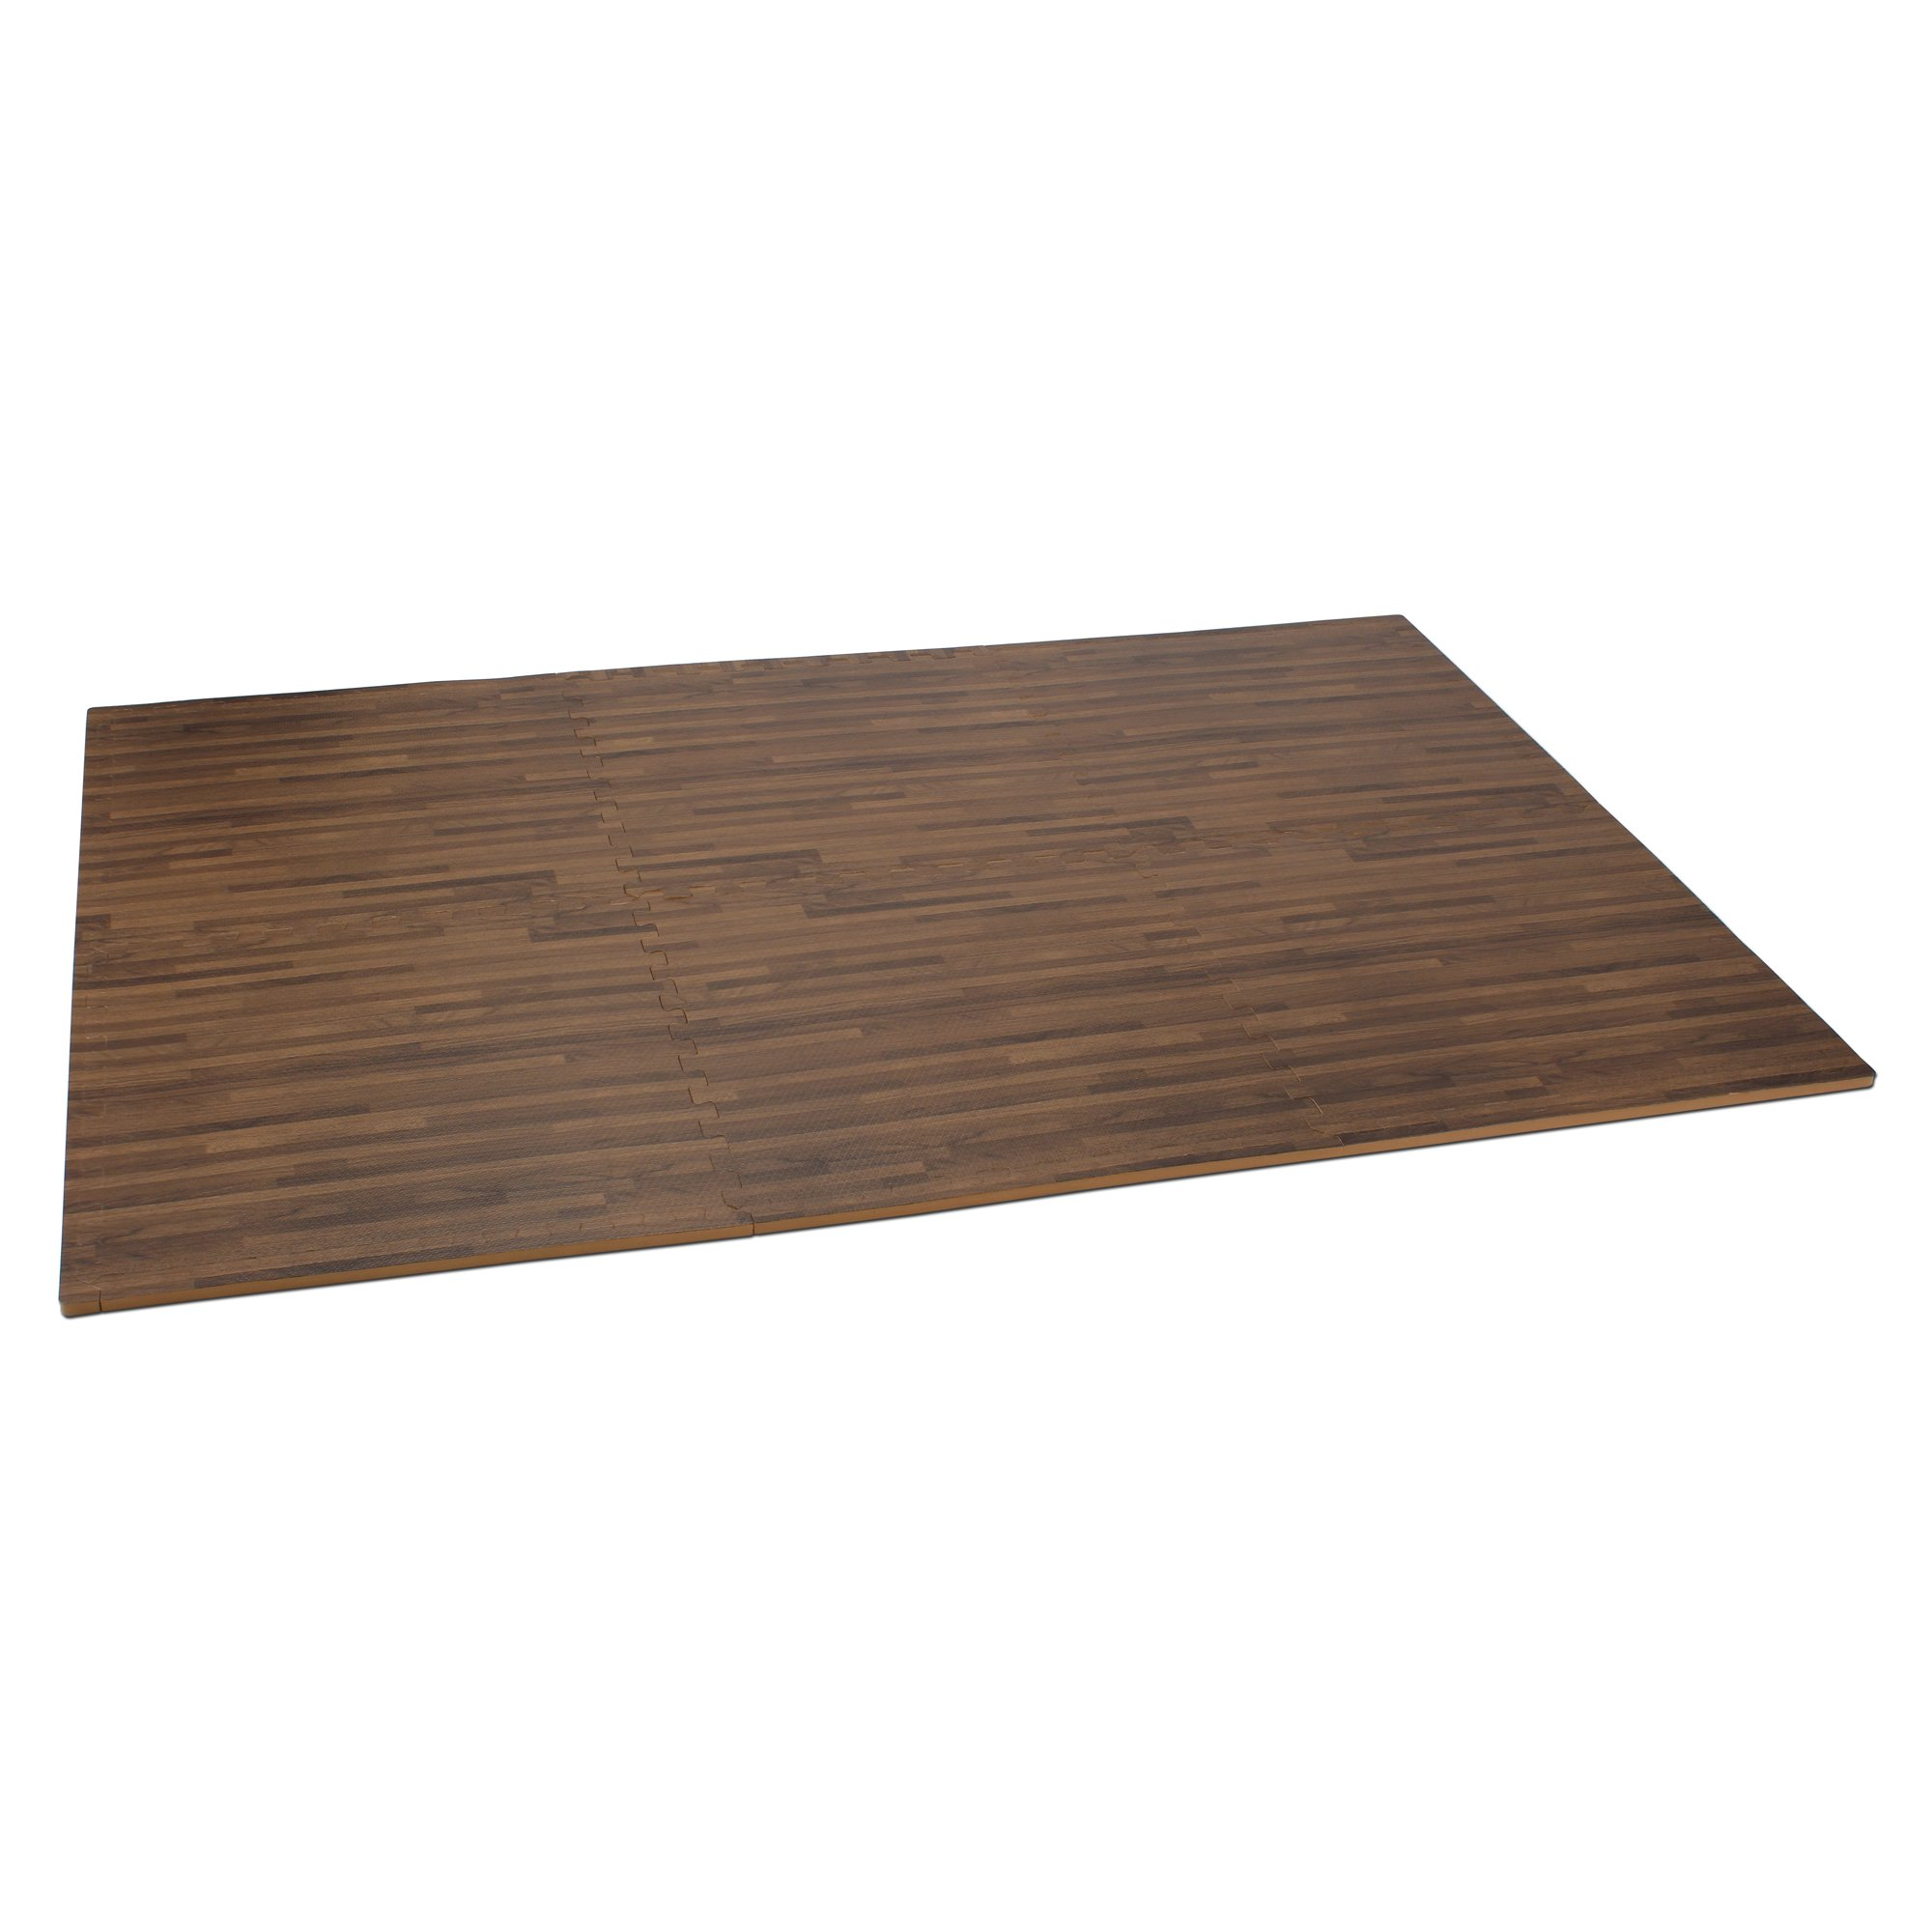 exercise mat ft floor mats eva colour sq mainframe interlocking itm tiles play foam gym col pack